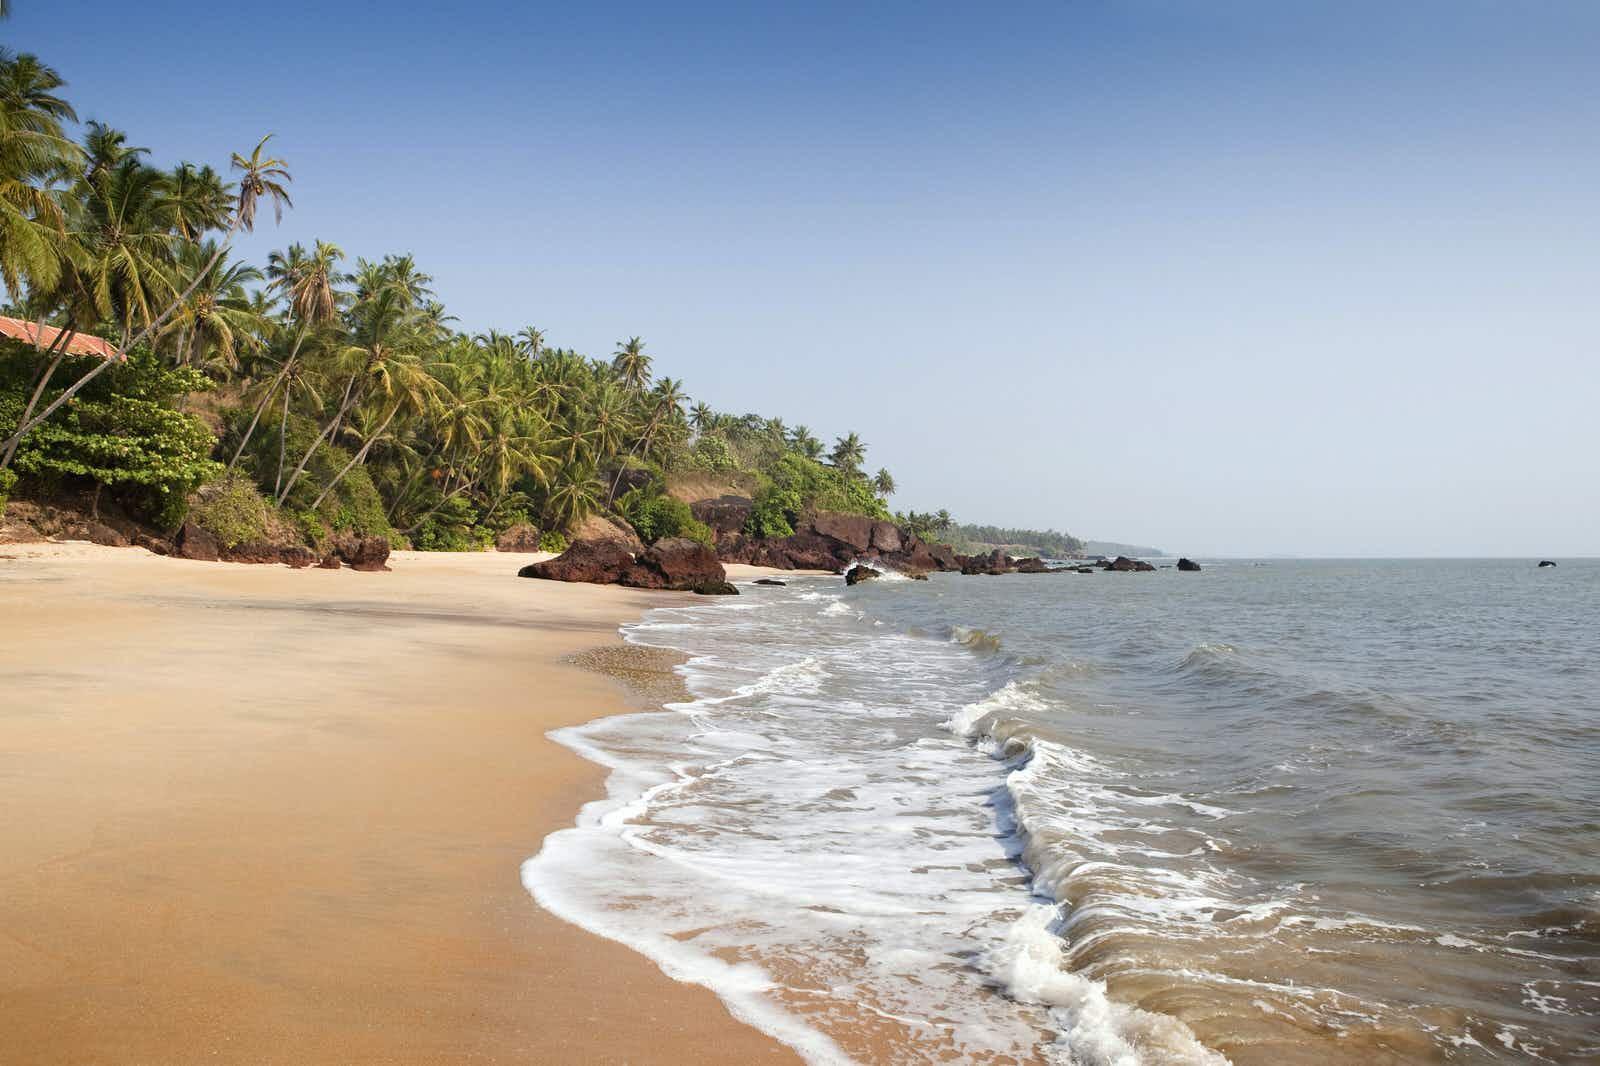 India, Kerala, Cannanore (Kannur), Adhi Kadalai, Costa Malabari small idyllic beach